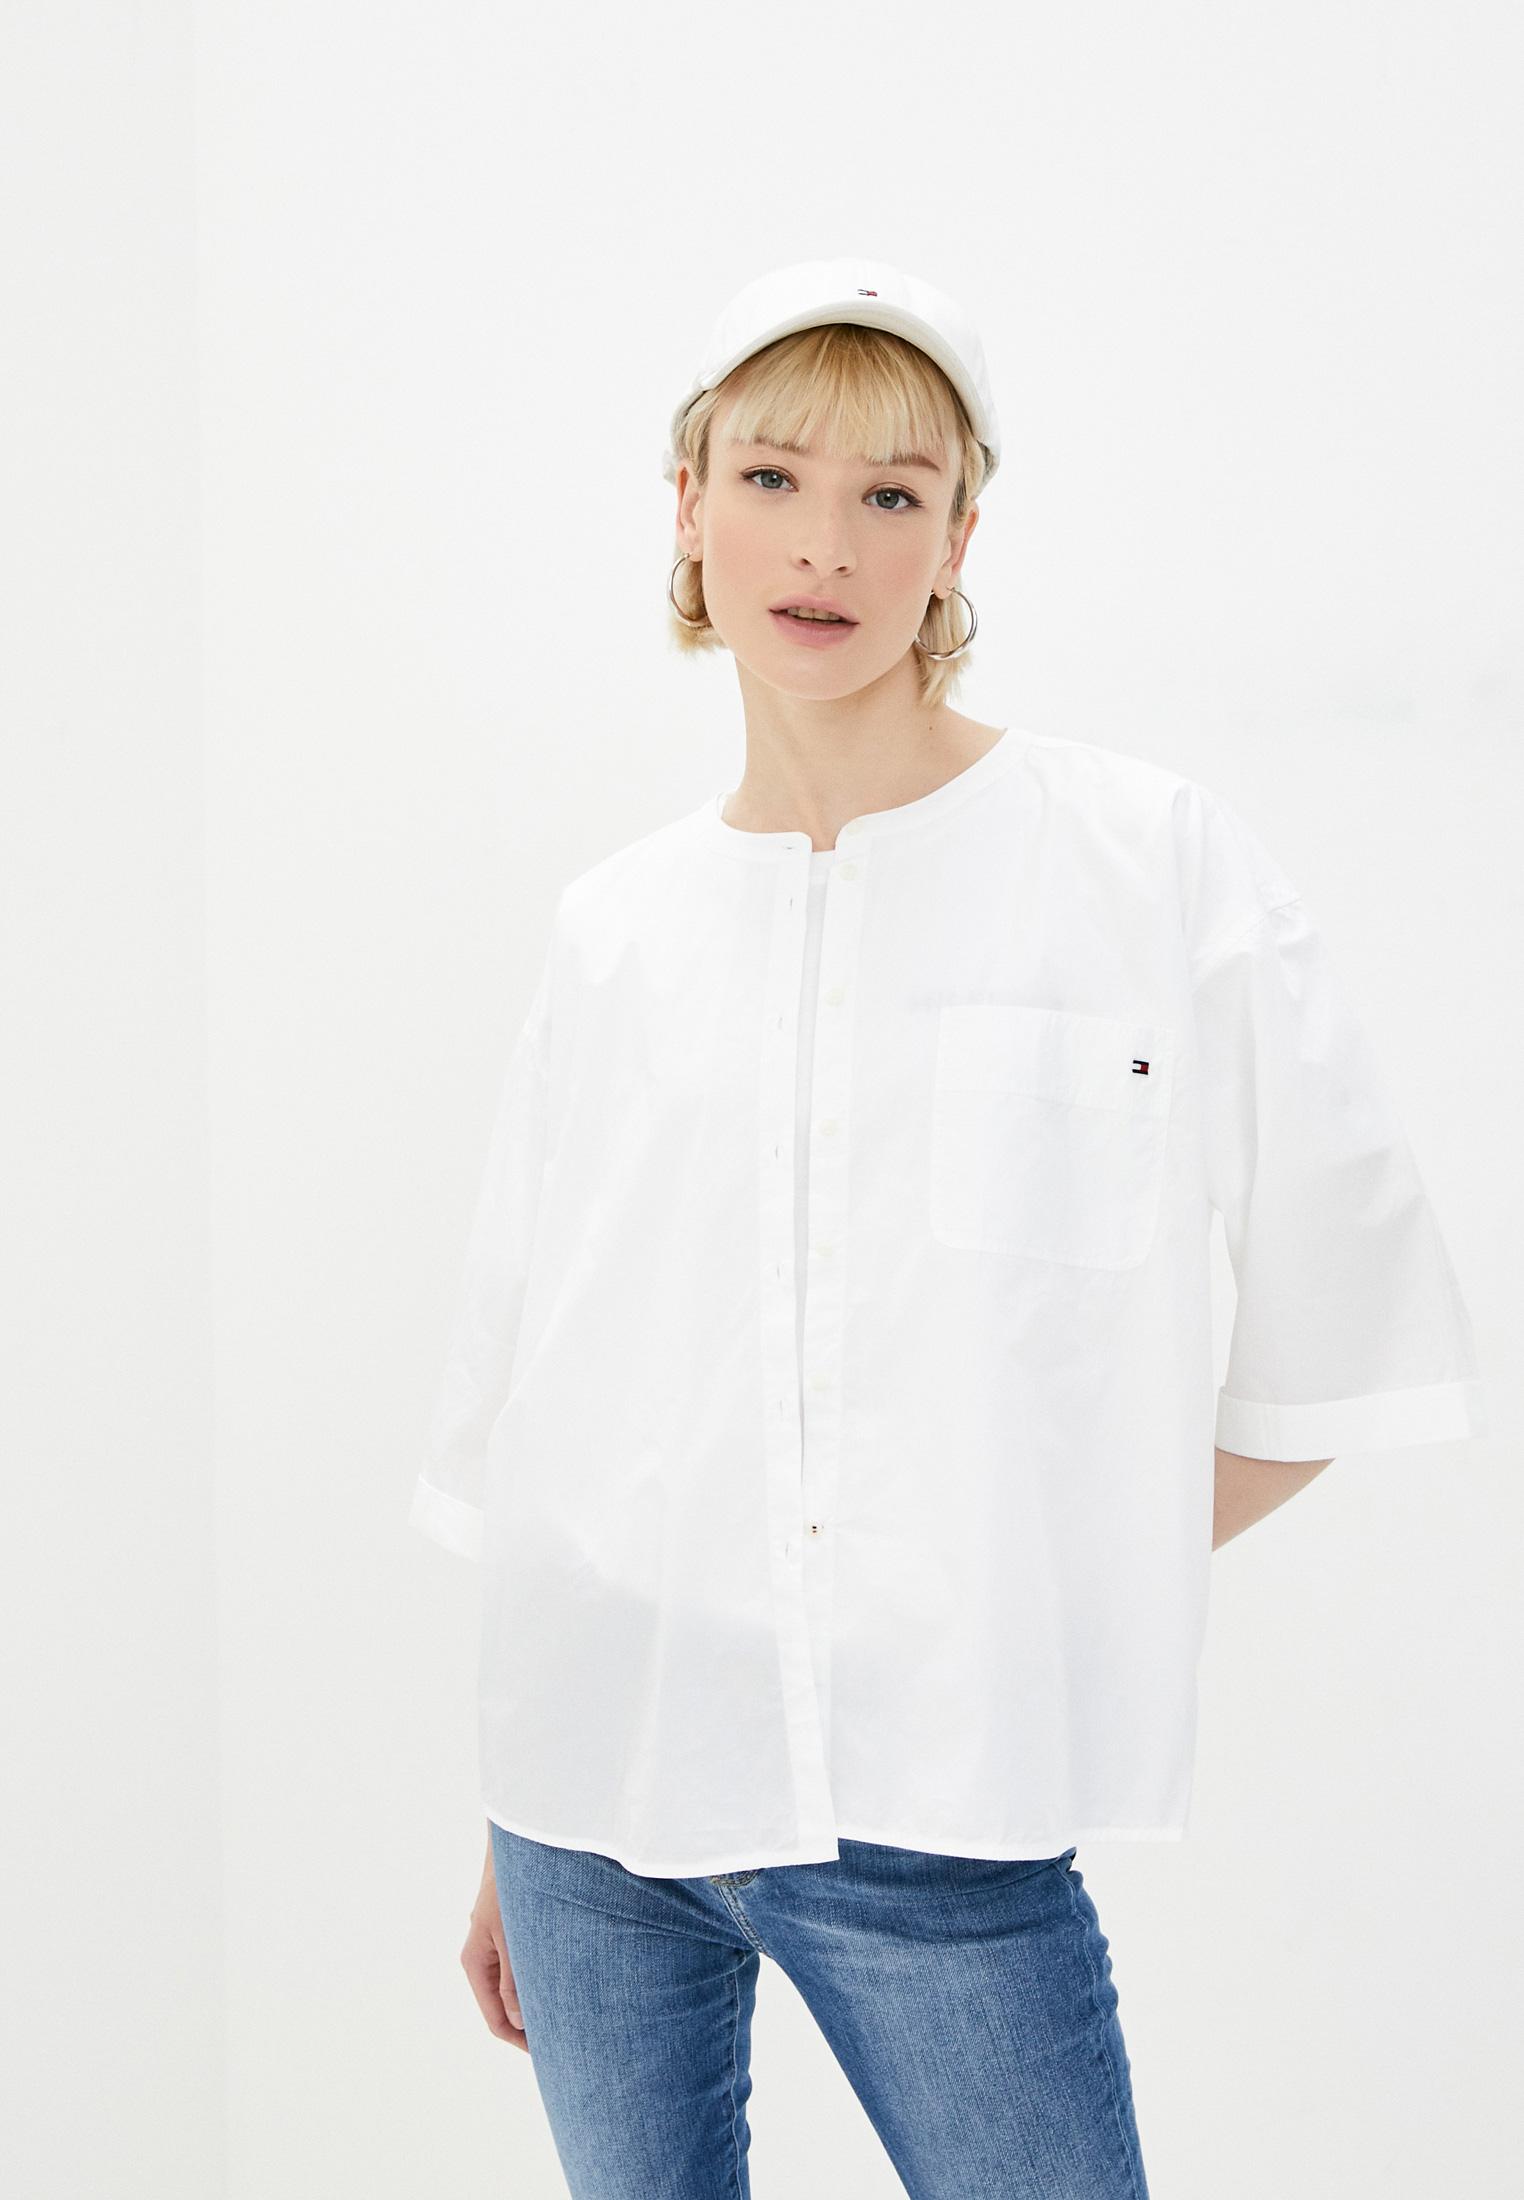 Рубашка с коротким рукавом Tommy Hilfiger (Томми Хилфигер) Рубашка Tommy Hilfiger